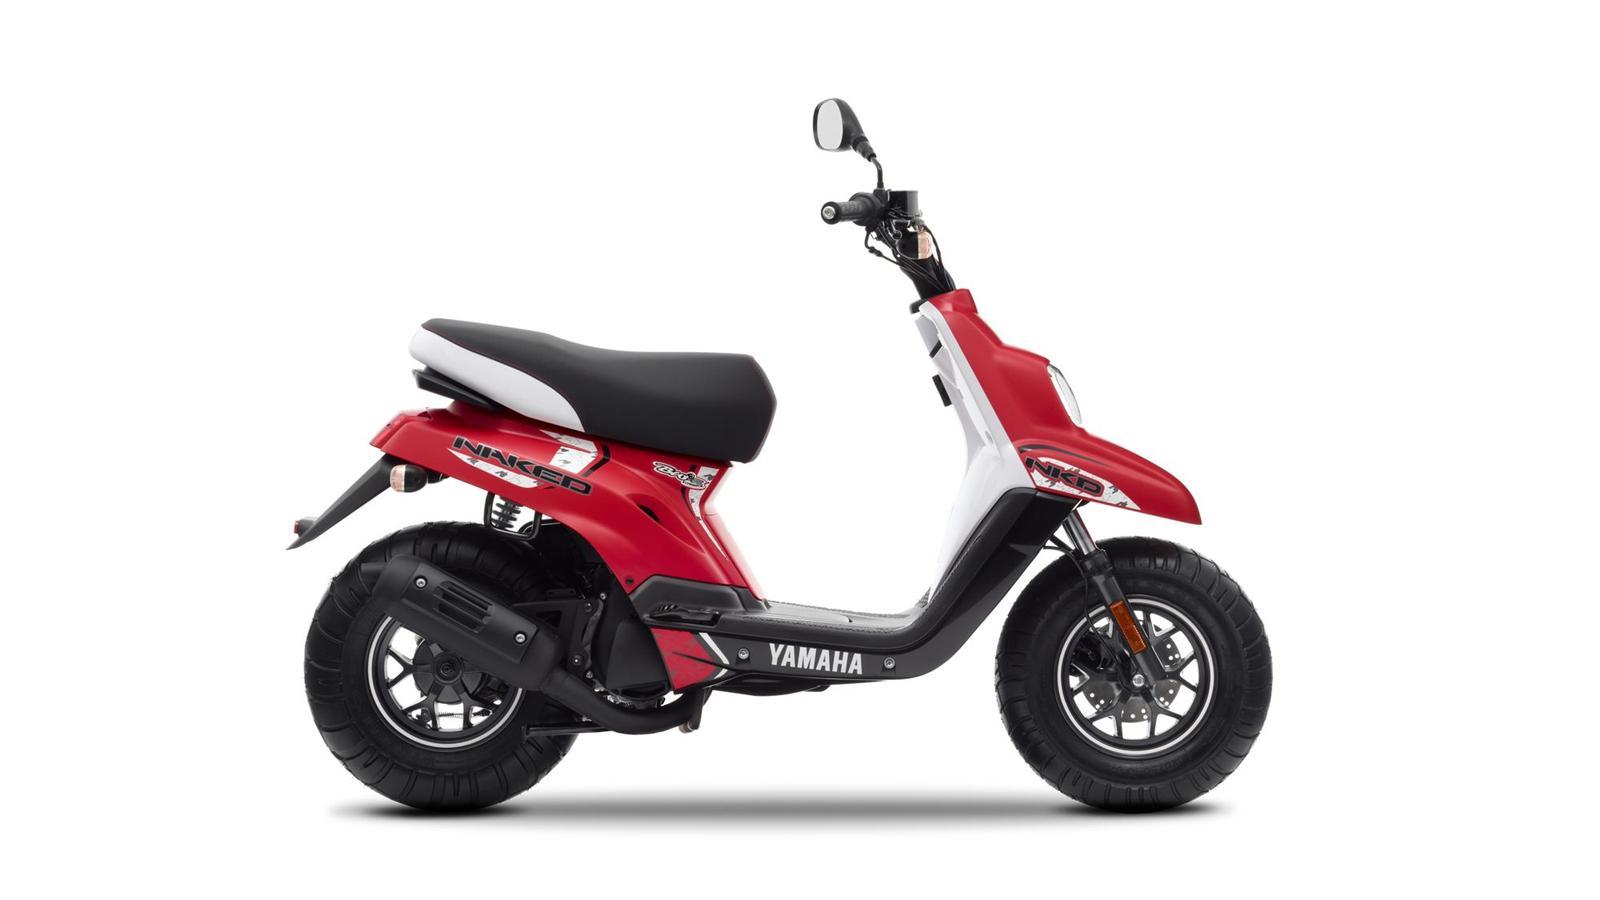 Мотоцикл Yamaha BWS 50 NAKED 2013 Цена, Фото